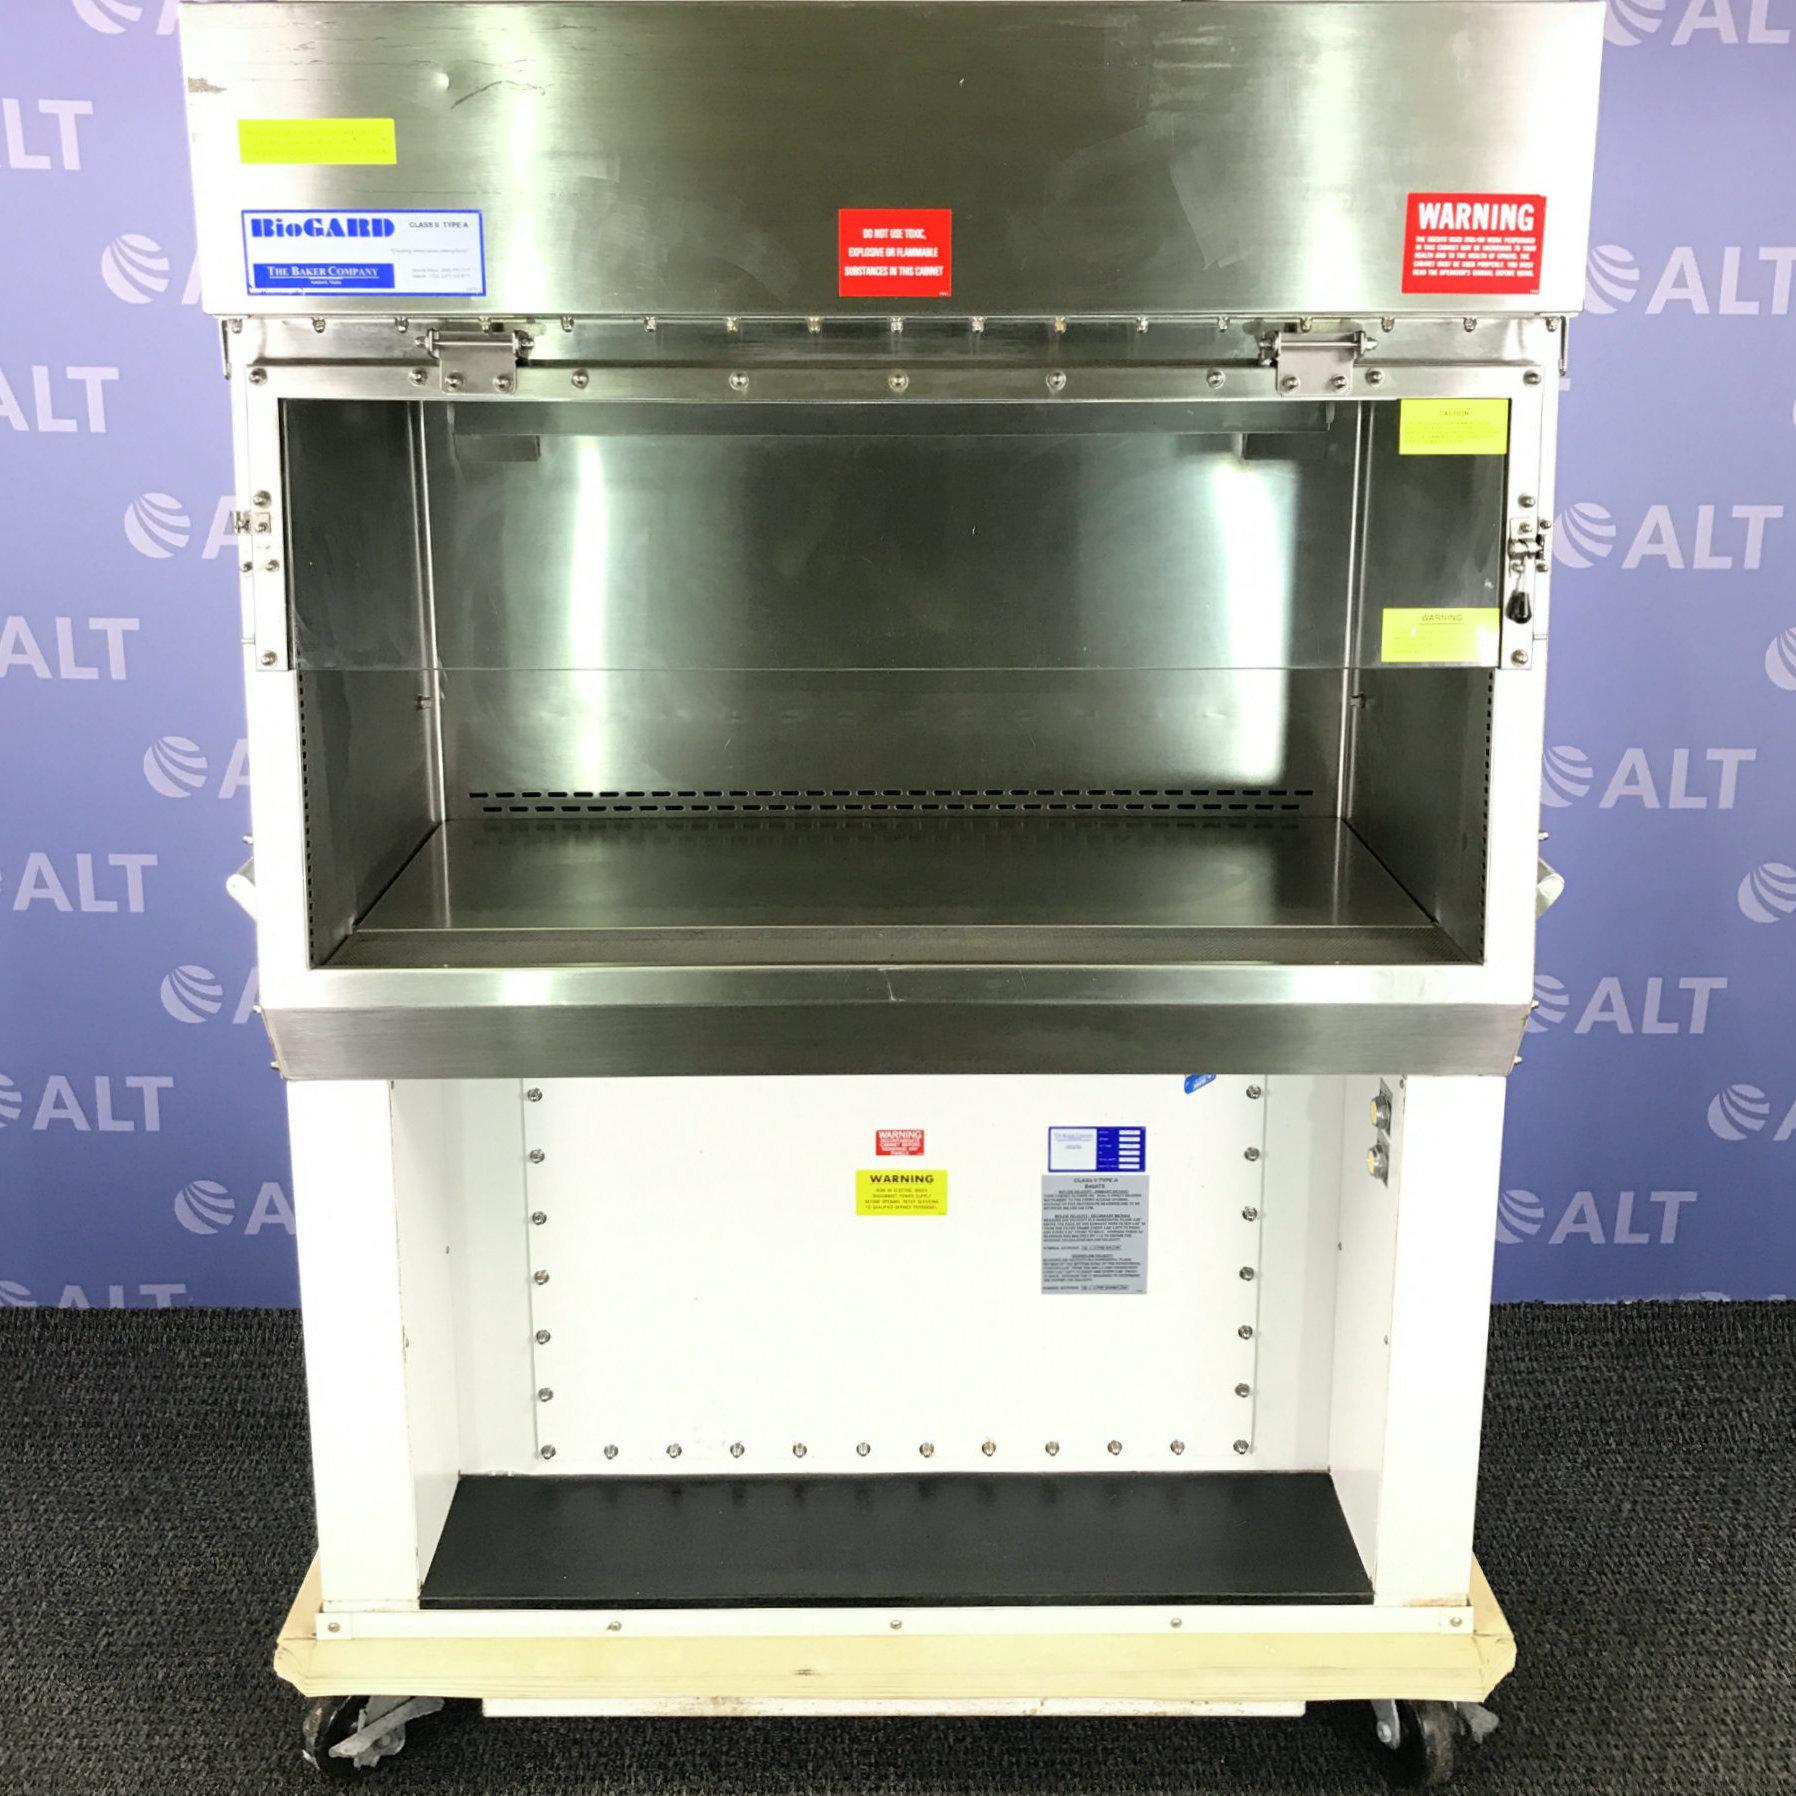 Baker Company B40-ATS Biogard Class II Type A Biosafety Cabinet Image